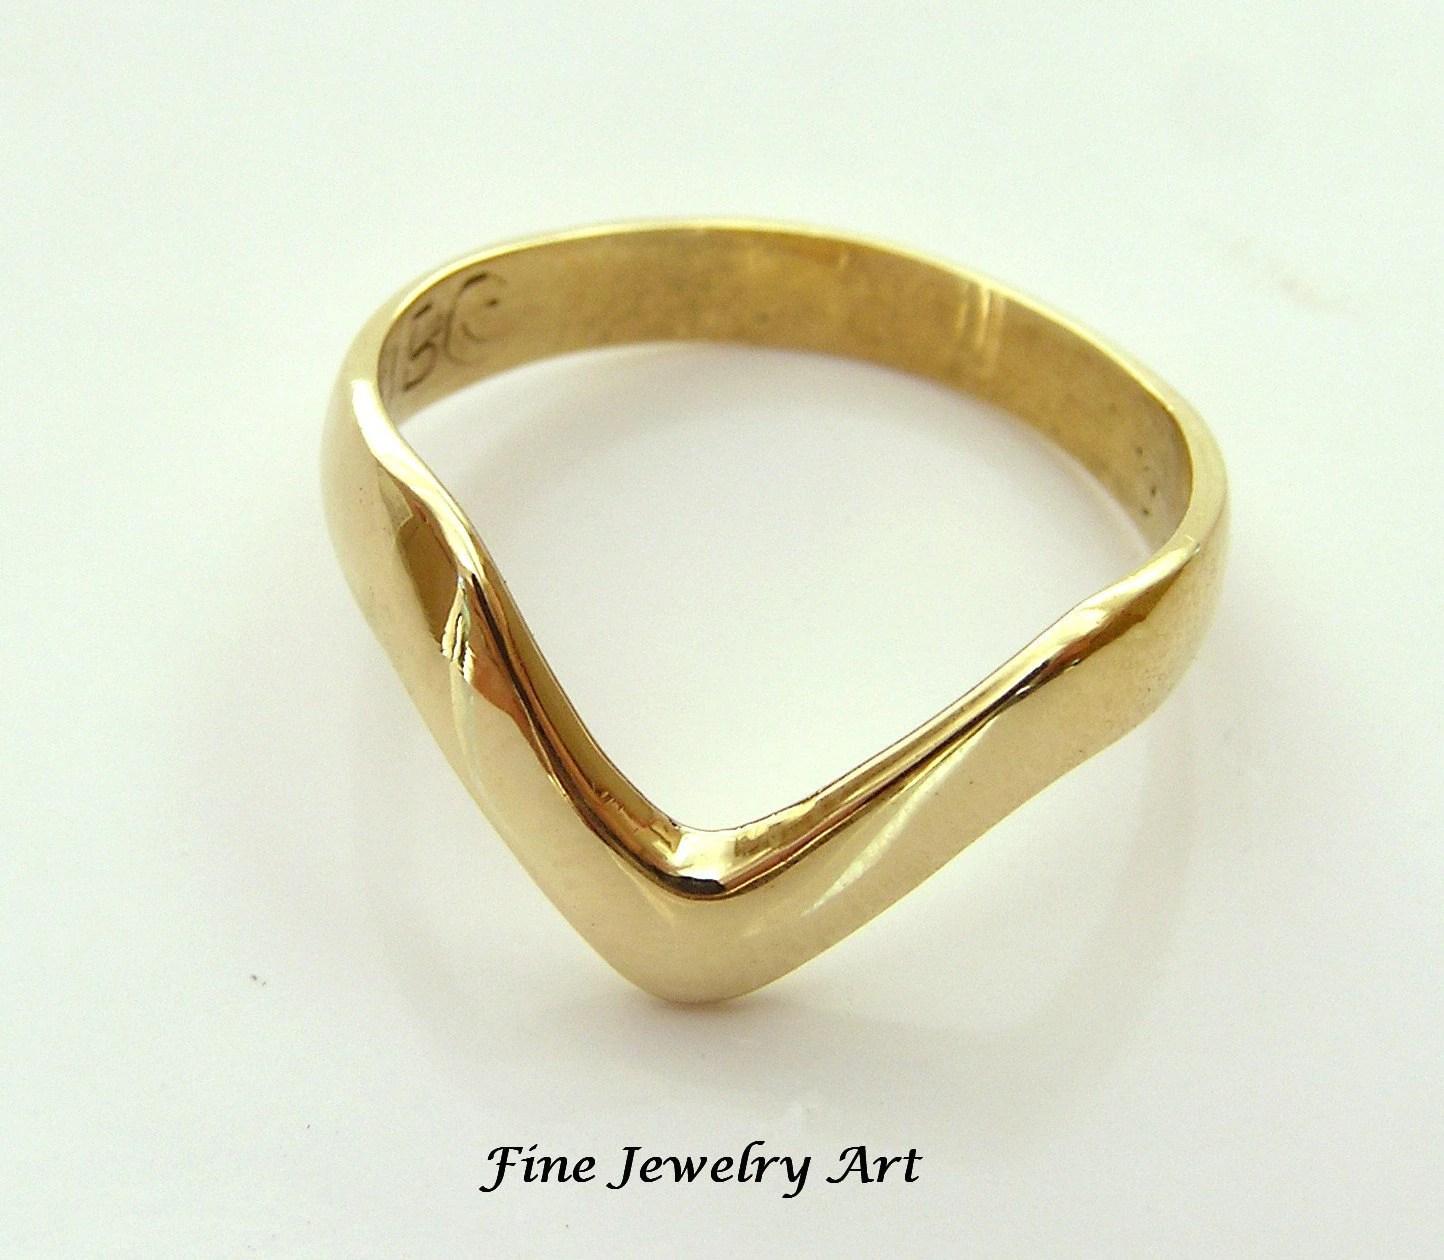 V Ring Chevron Ring Shaped Band Handmade In 14k Yellow